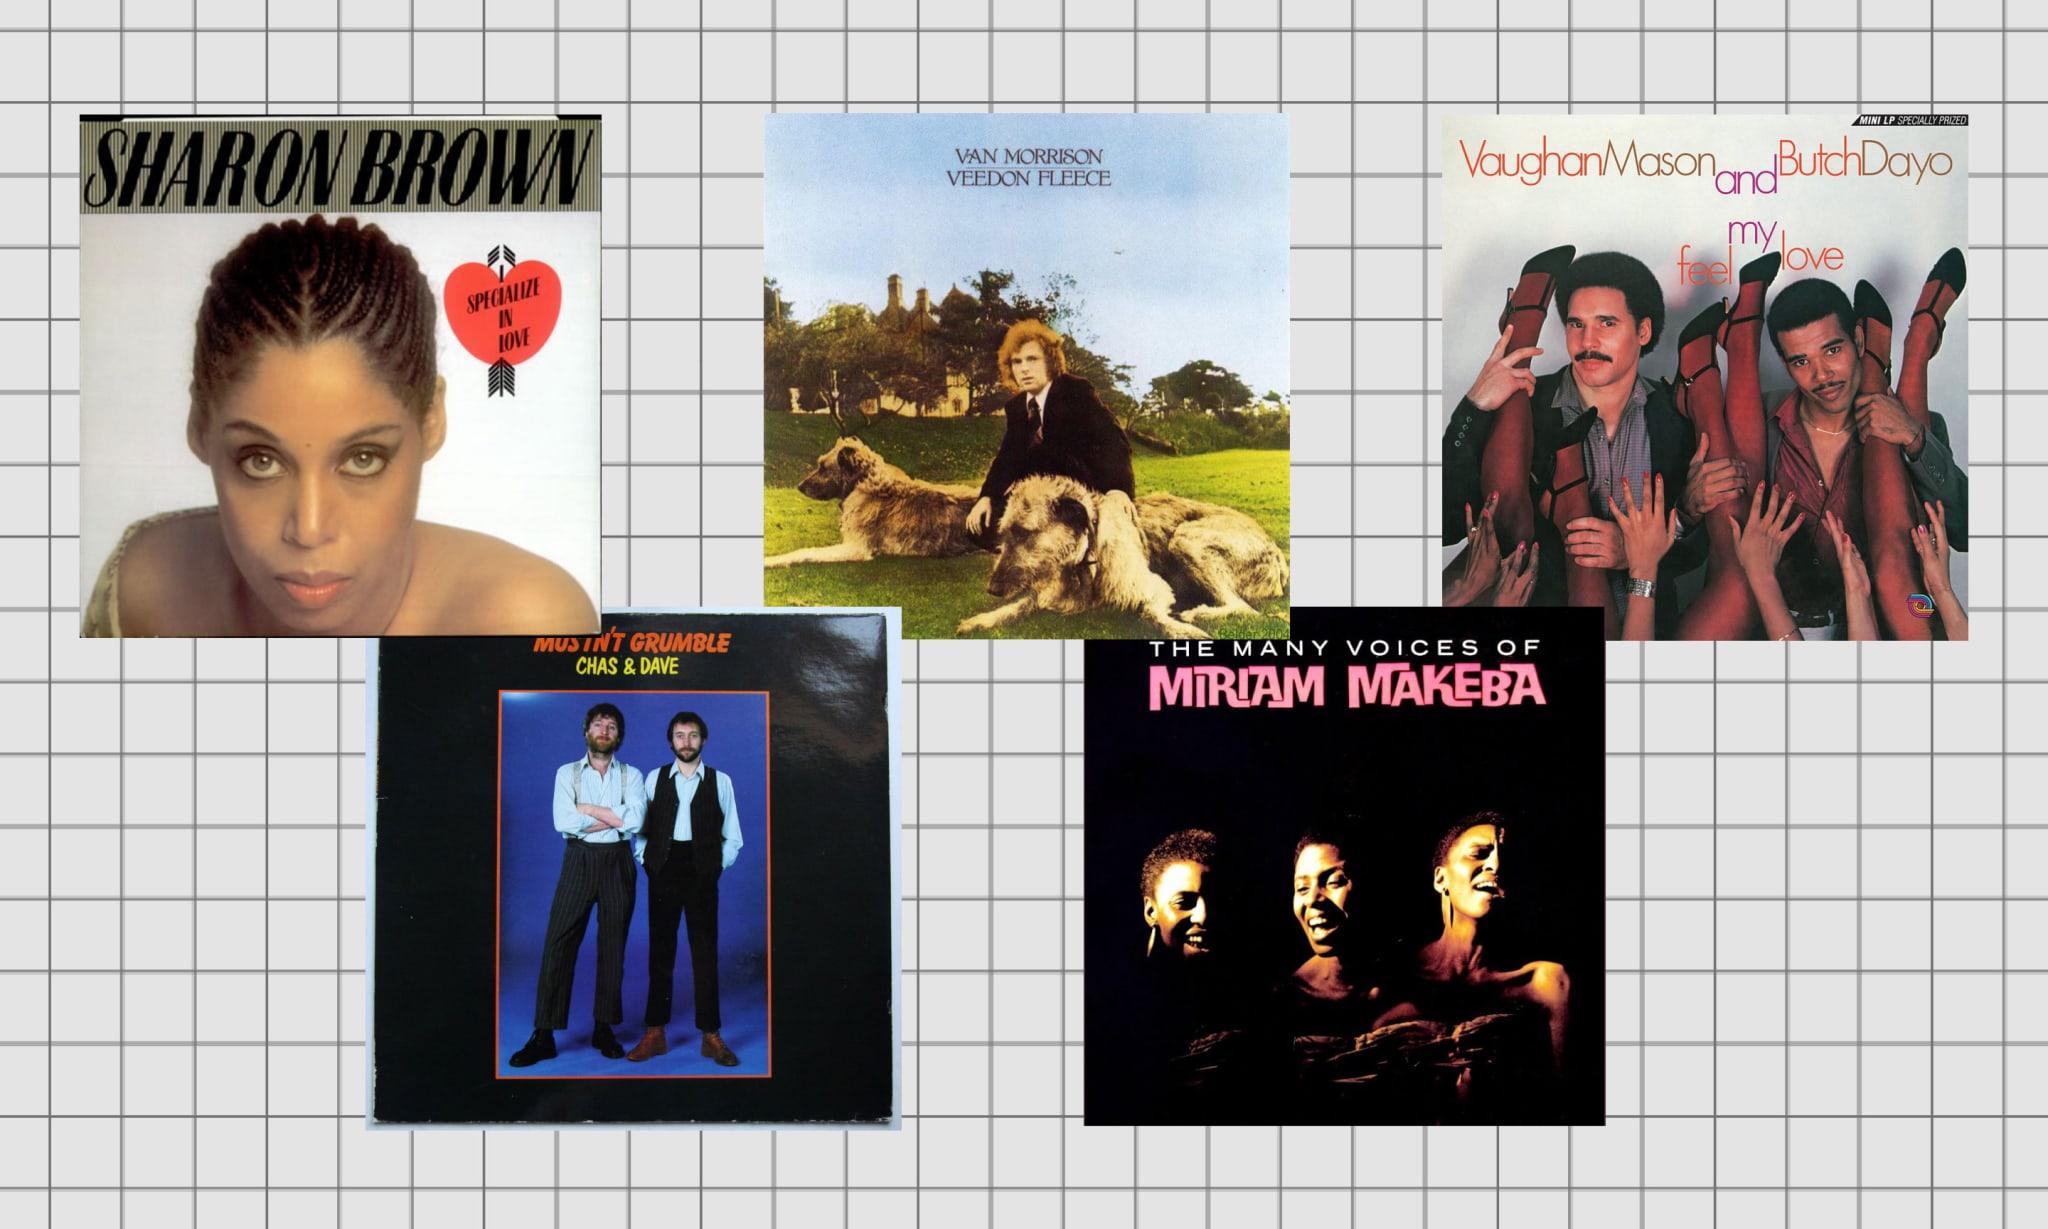 Five album covers.